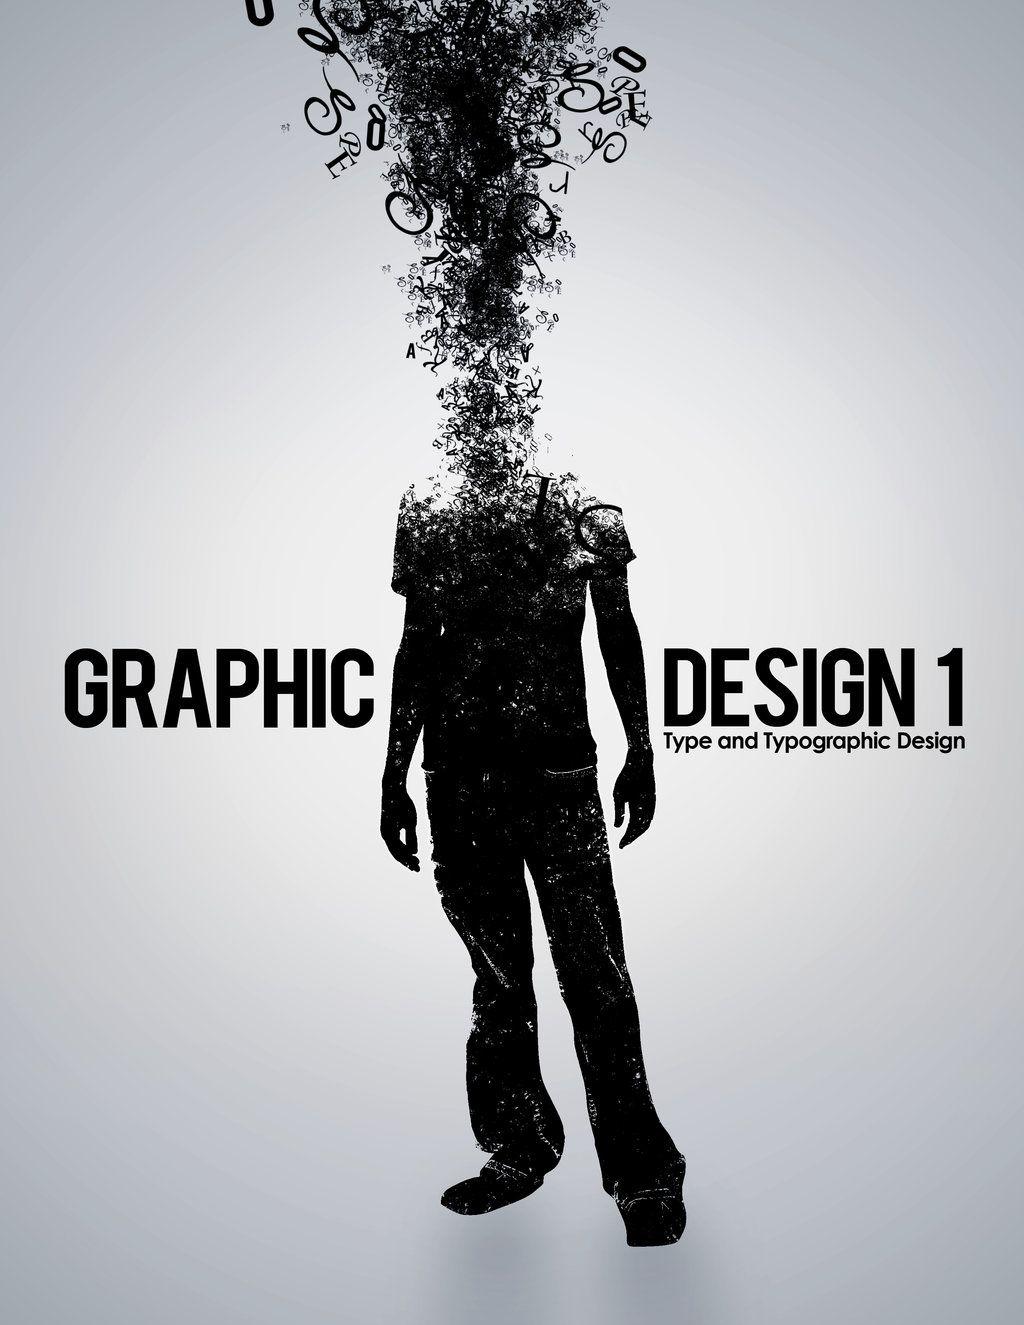 Graphics Design Poster An Ever Growin.